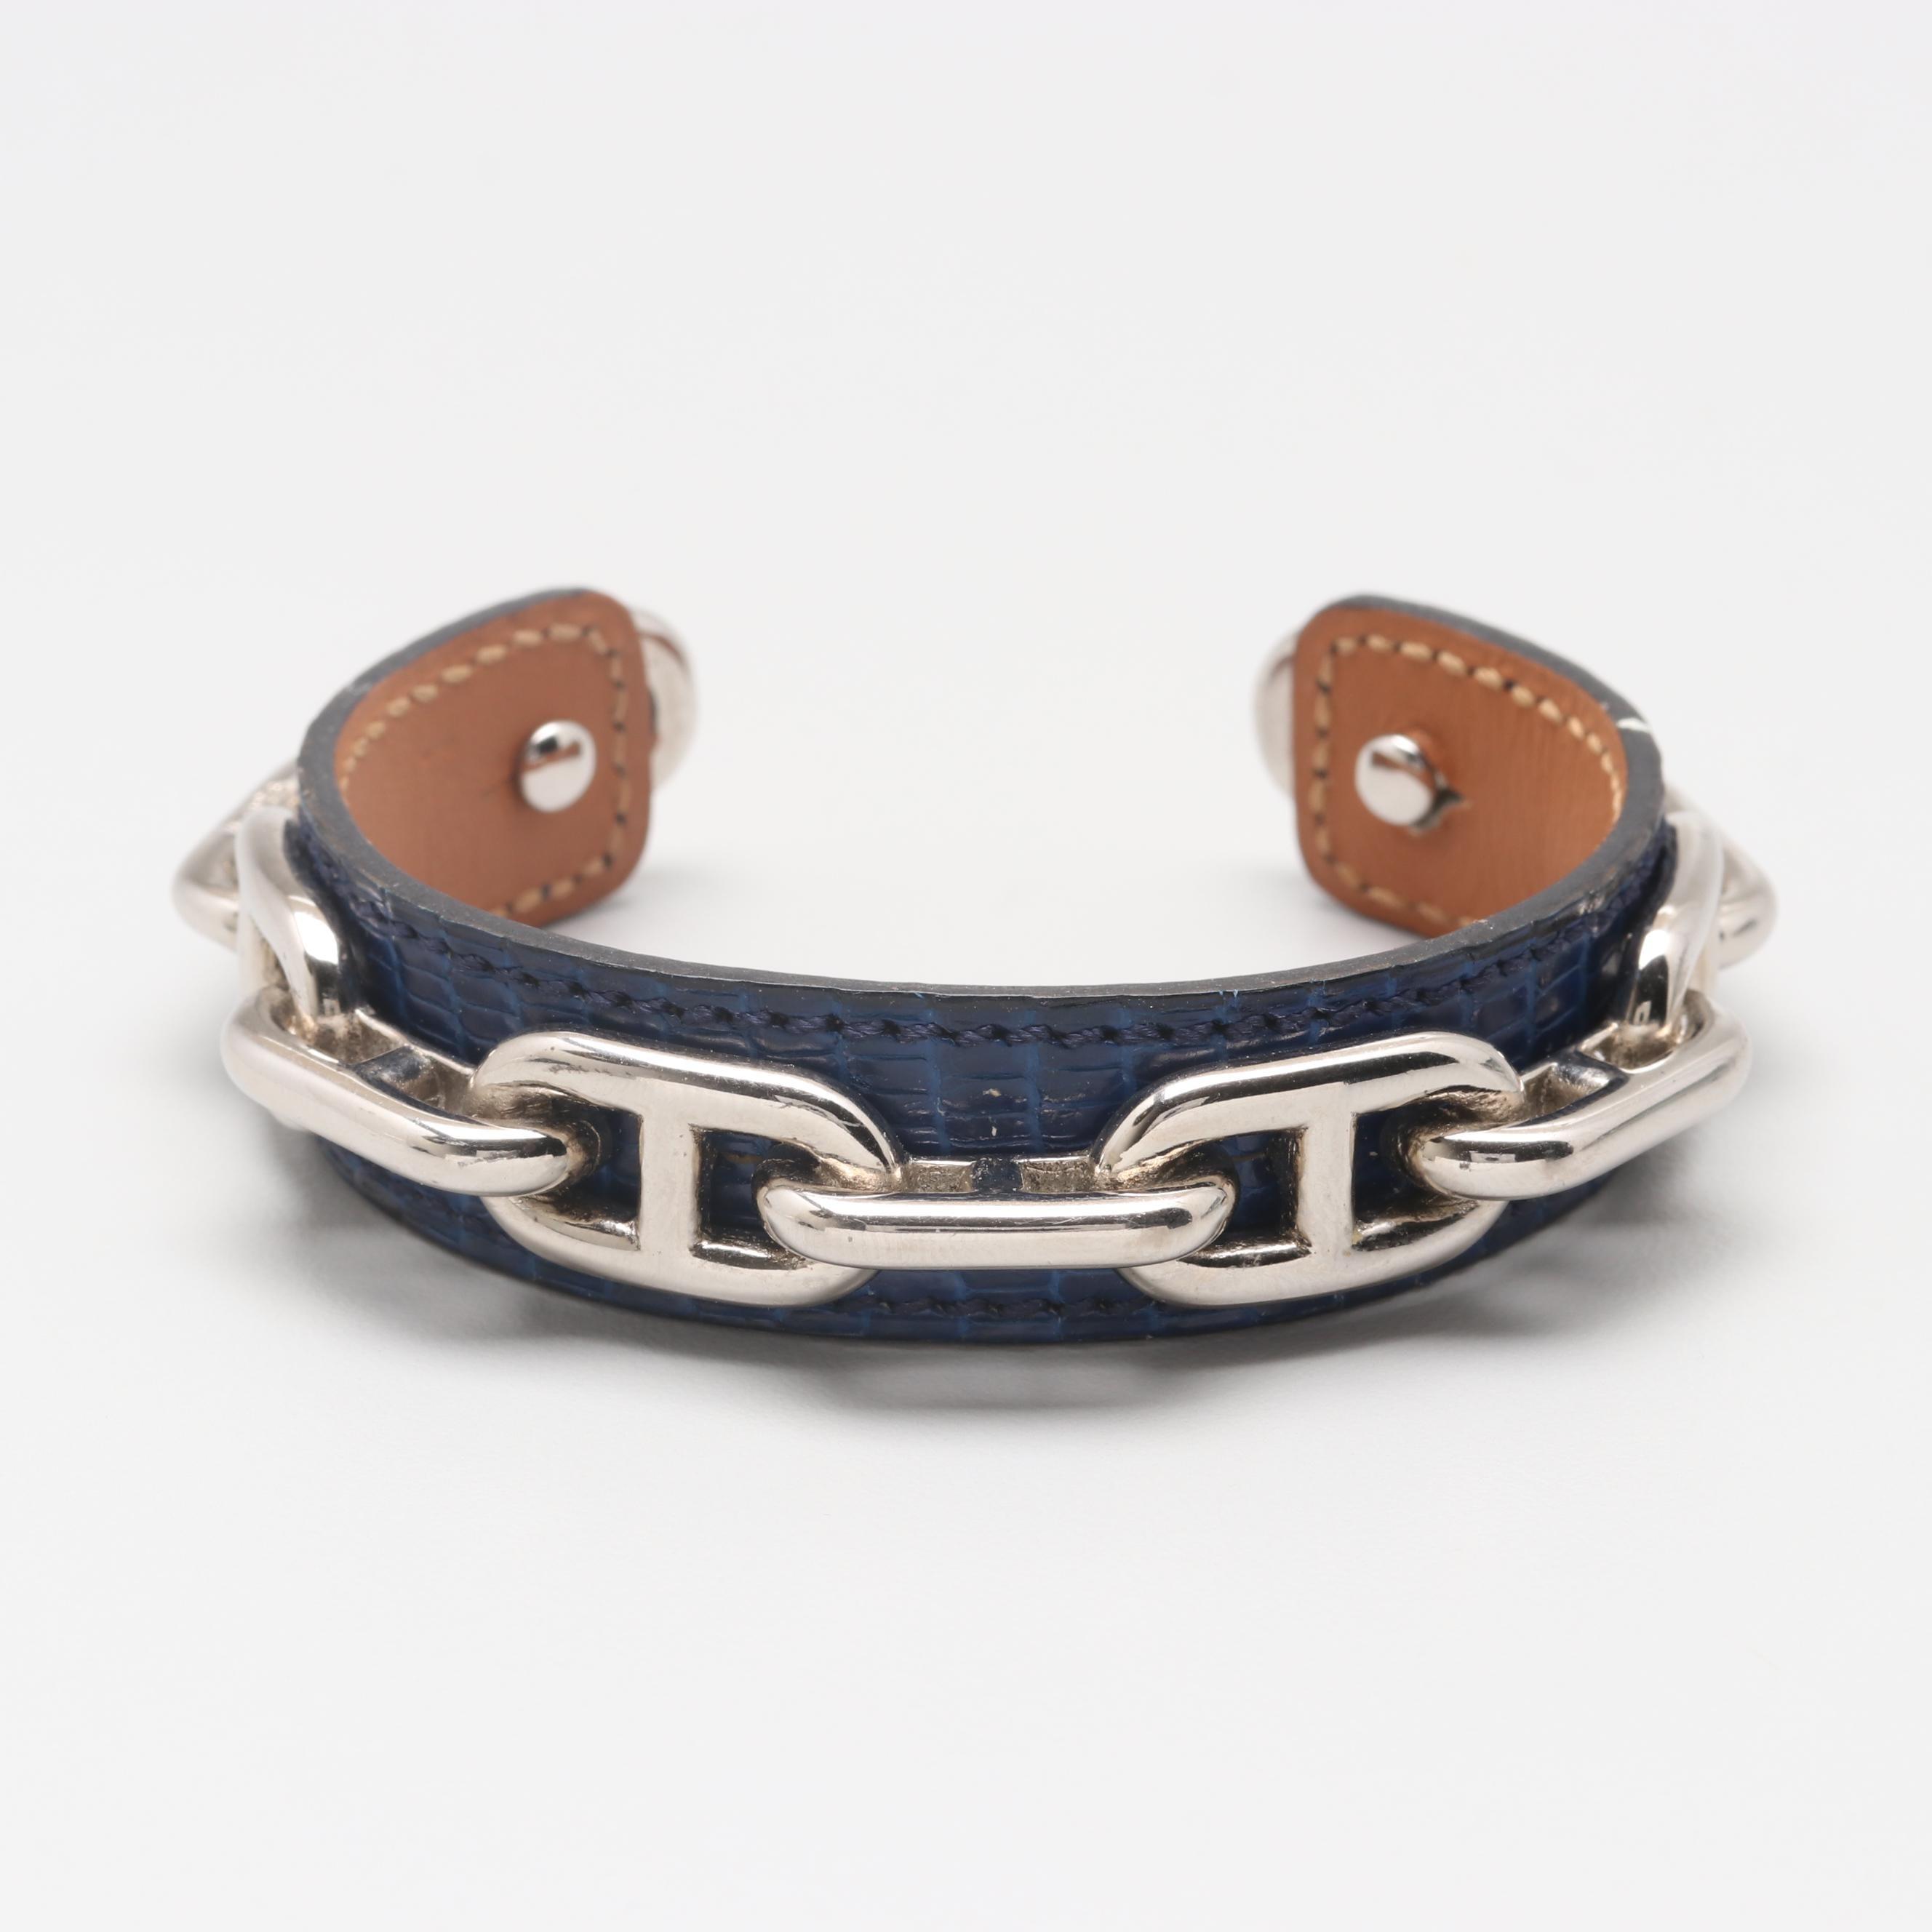 "Circa 1980s Hermès Embossed Crocodile ""Chaine D'Ancre"" Cuff Bracelet"